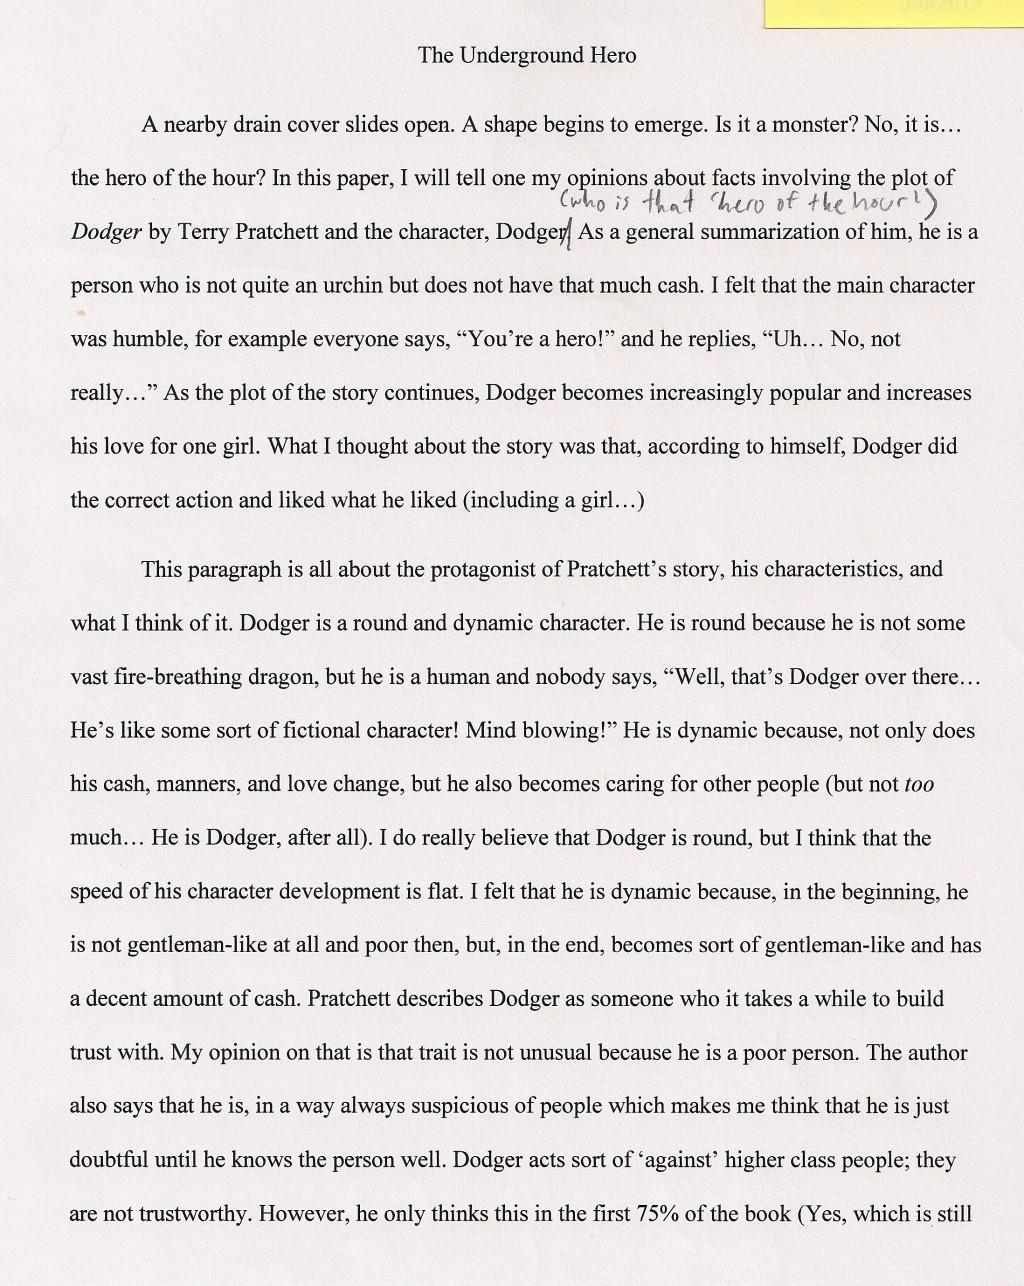 001 Hero Essays The Underground Staggering Essay Examples My Michigan Superhero Large